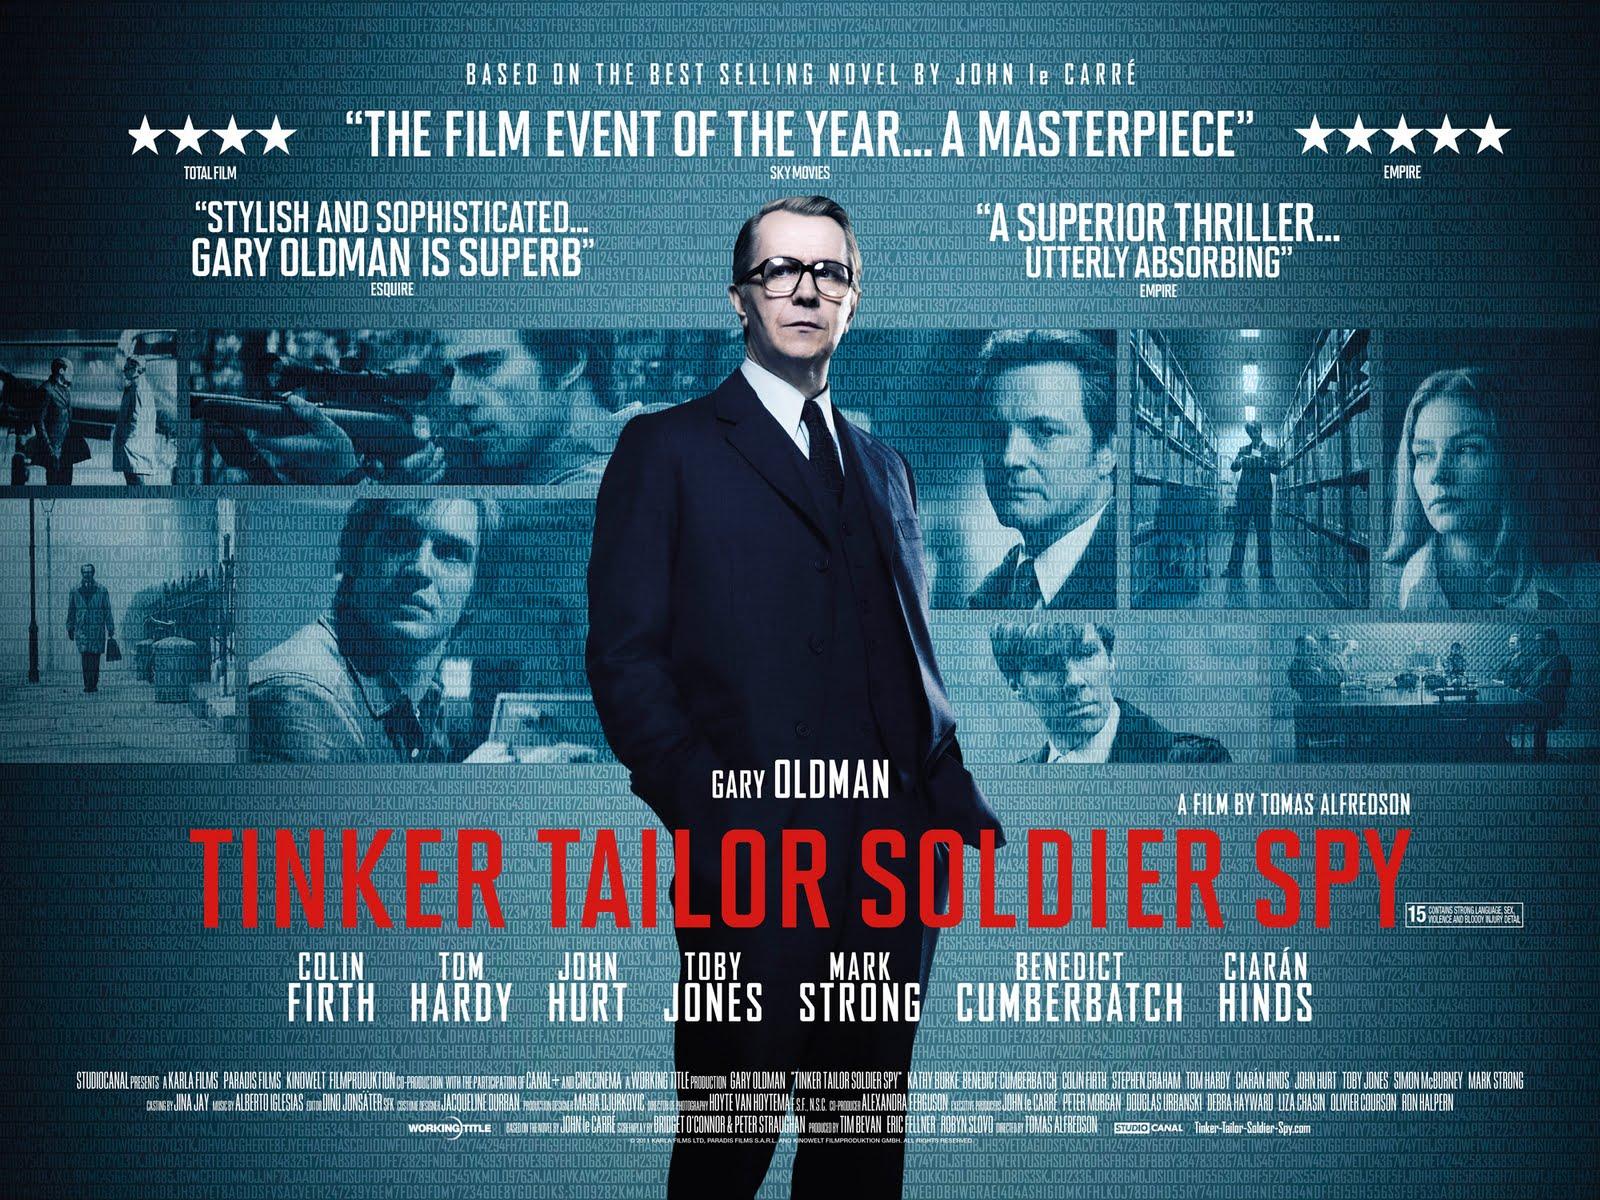 http://2.bp.blogspot.com/-Seh-k1I5I6I/Tt_6rQrblMI/AAAAAAAACbU/jLPLJD1tzDY/s1600/Tinker-Tailor-Soldier-Spy-Poster-Quad.jpg